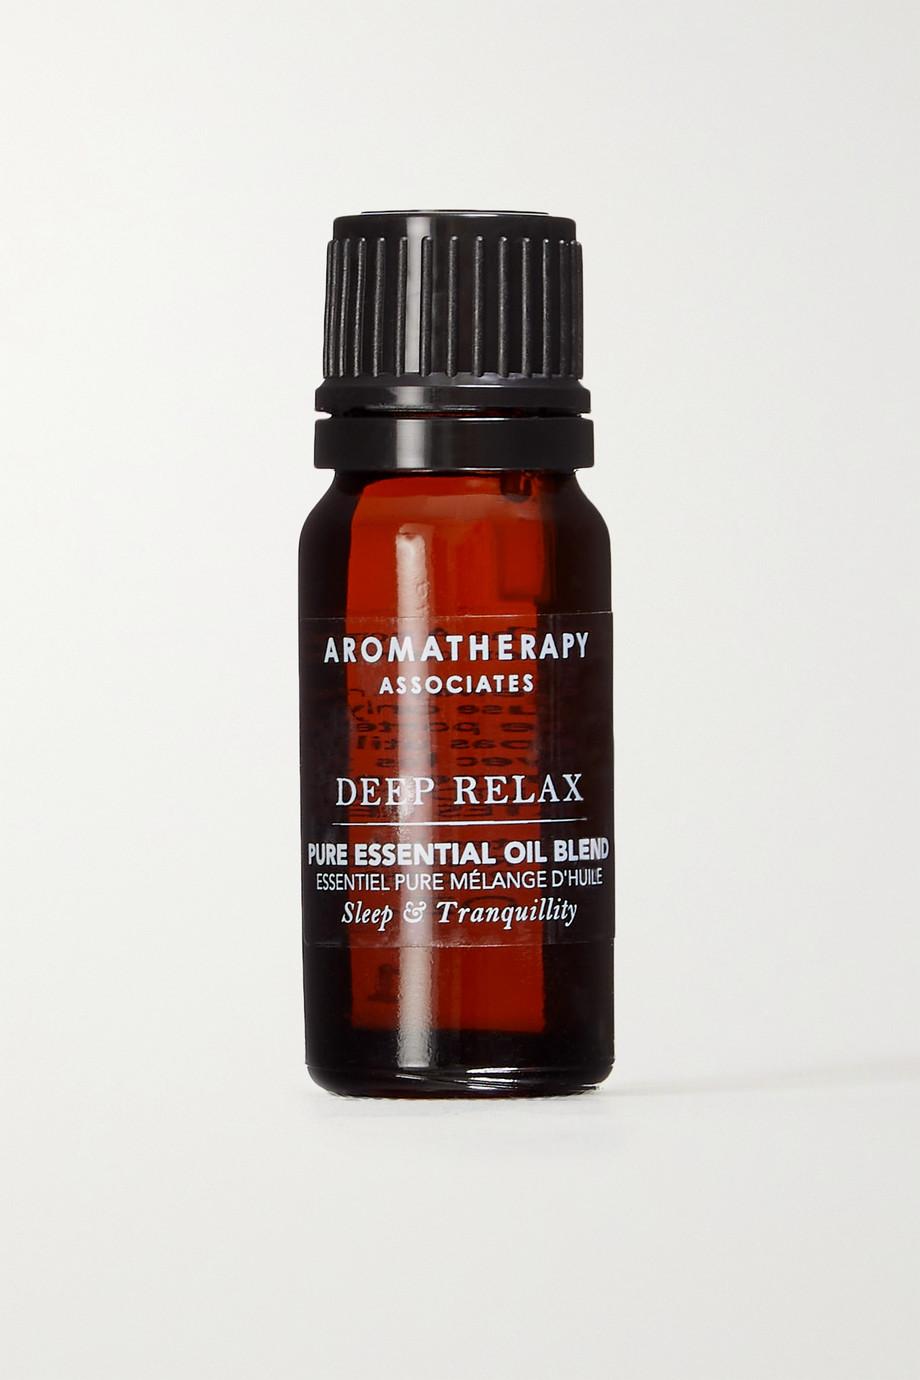 Aromatherapy Associates Deep Relax Pure Essential Oil Blend, 10ml